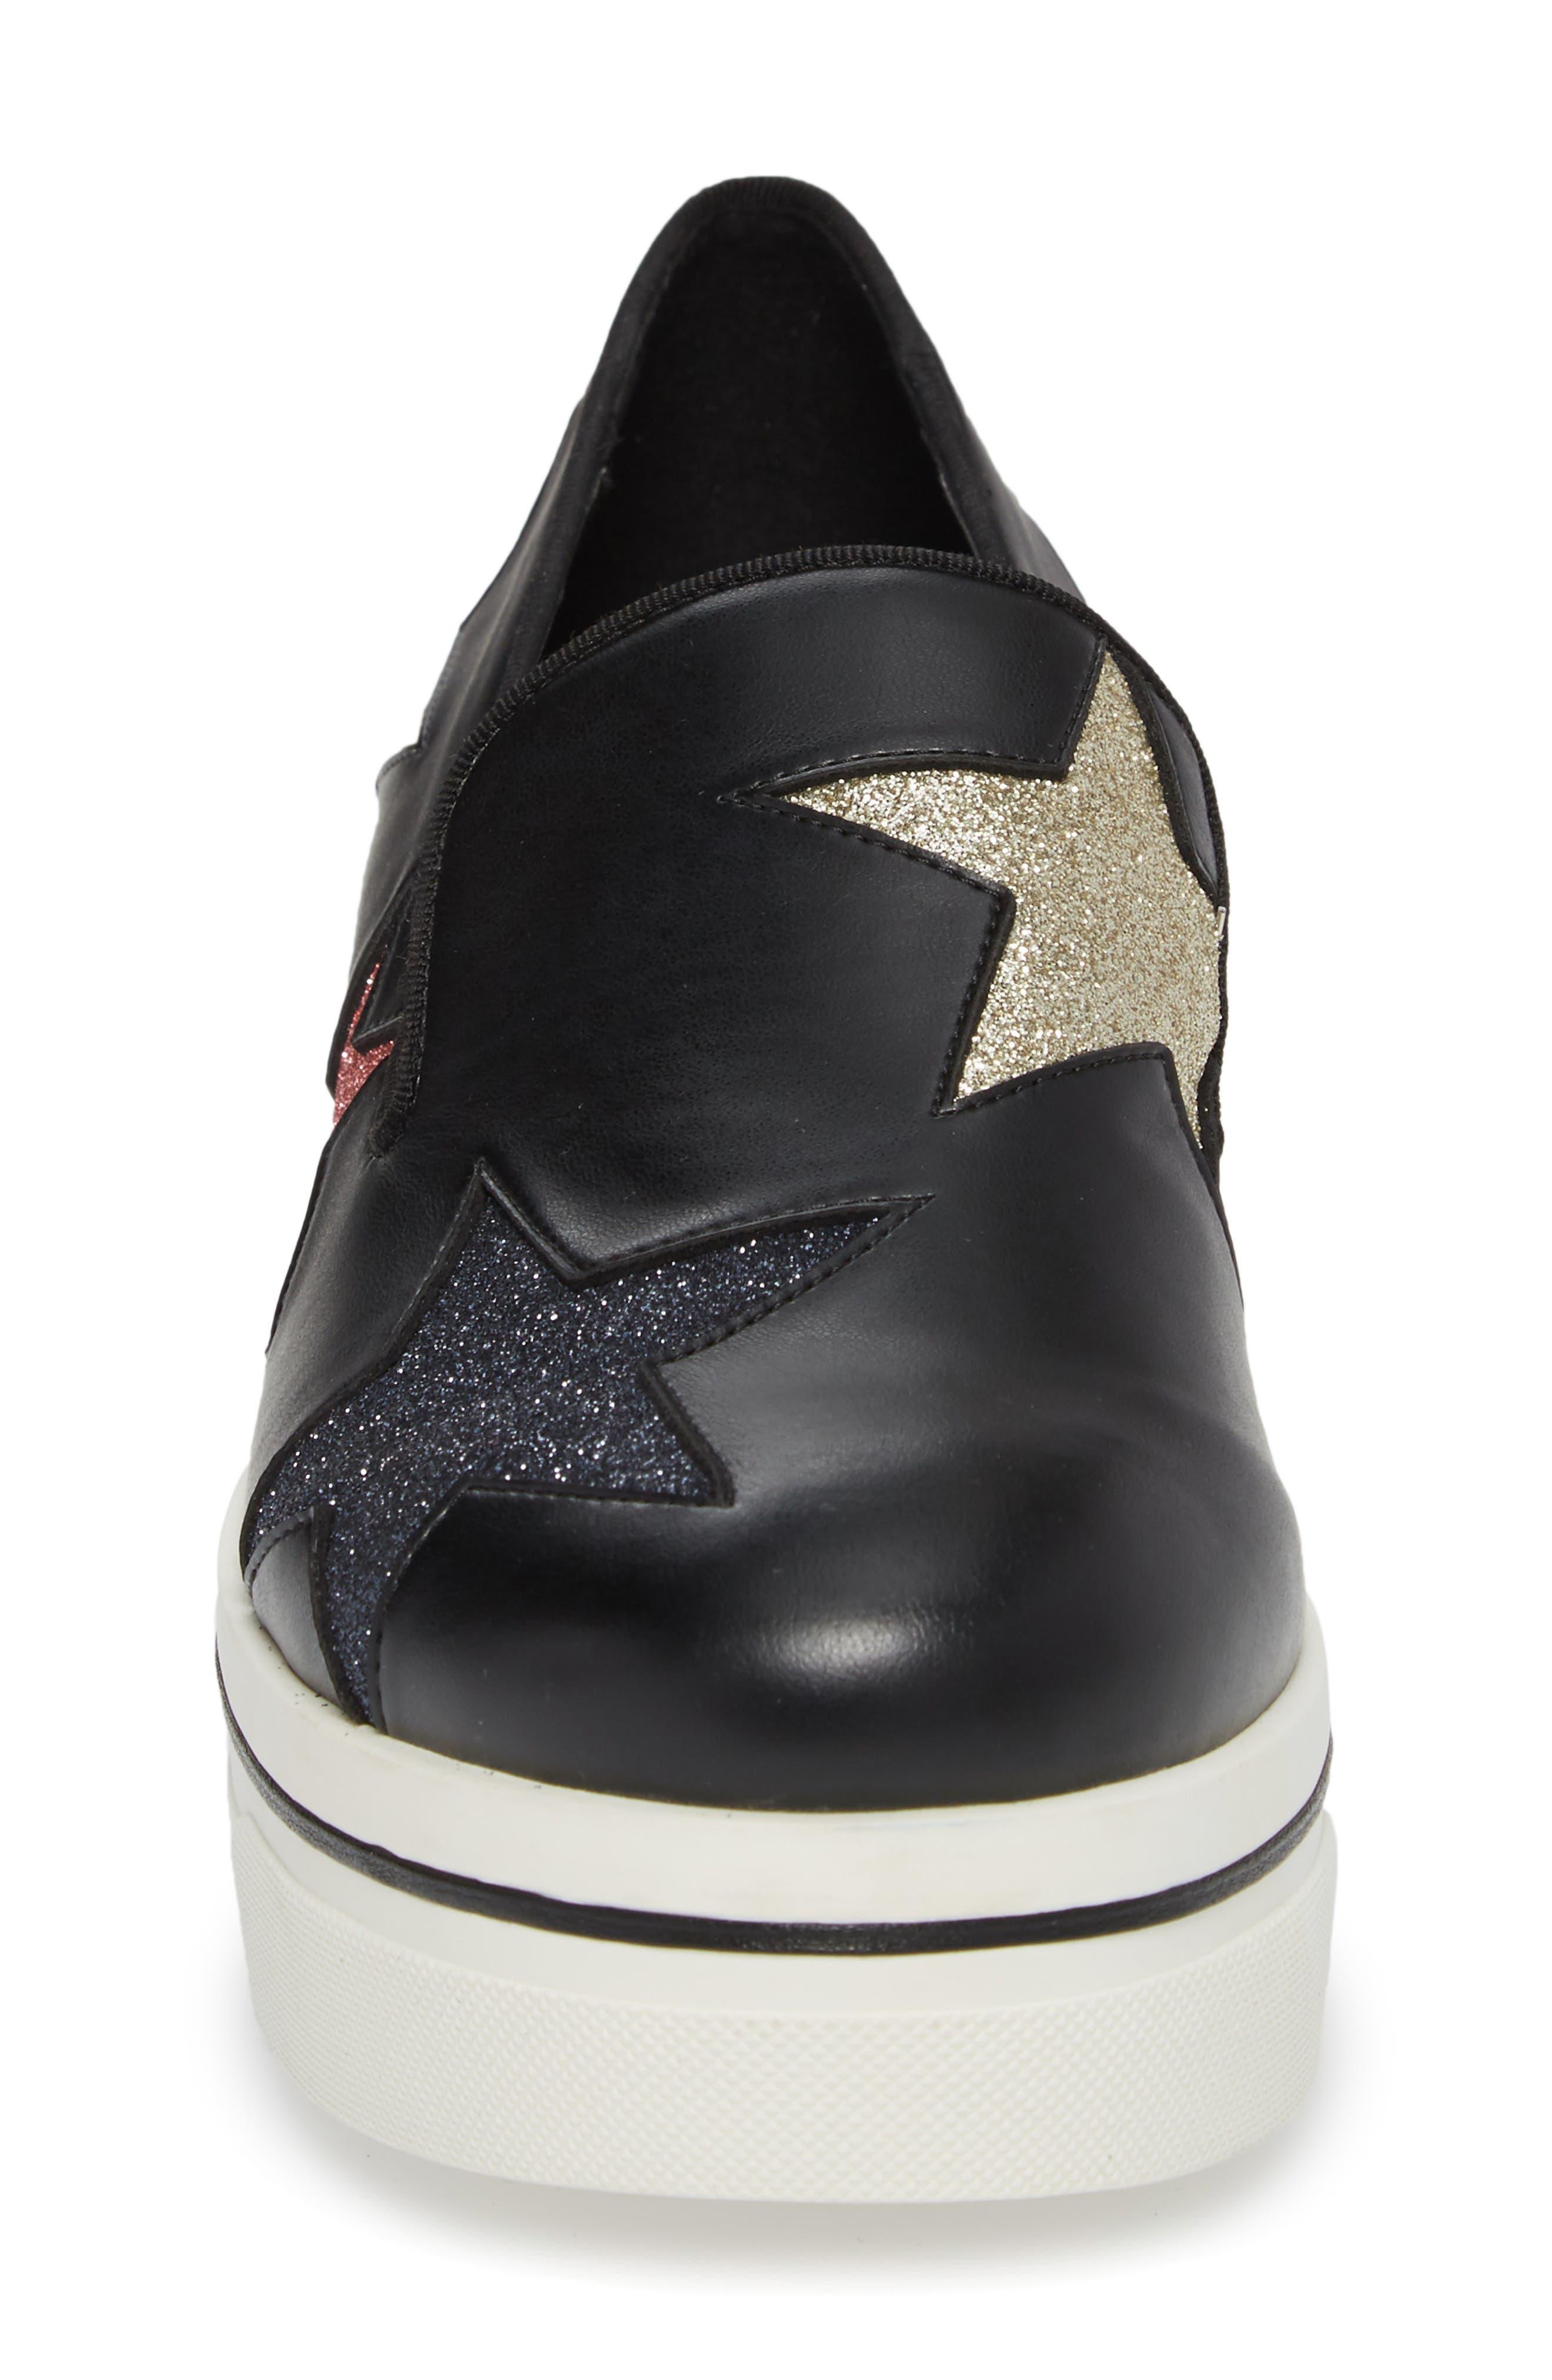 Binx Star Loafer,                             Alternate thumbnail 4, color,                             012